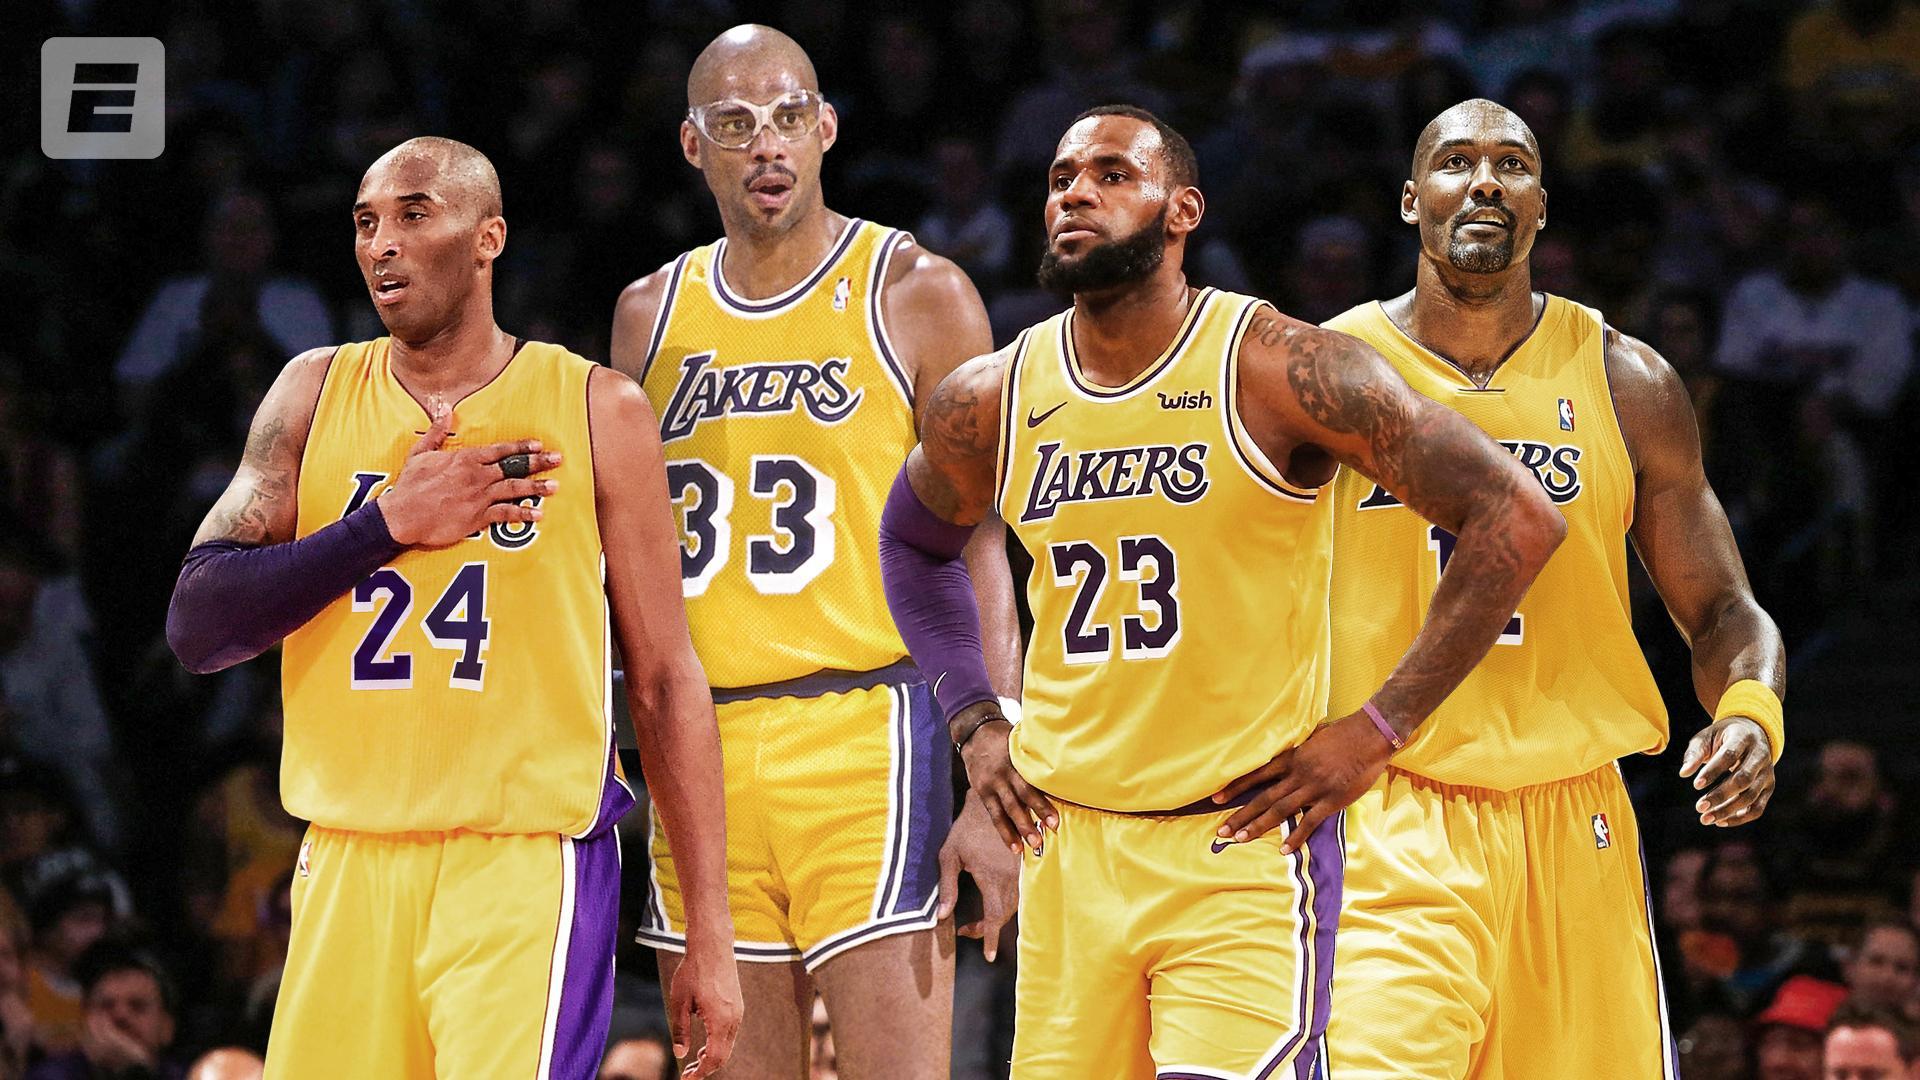 The top 4 leading scorers in NBA history. https://t.co/laj2WXZfLv